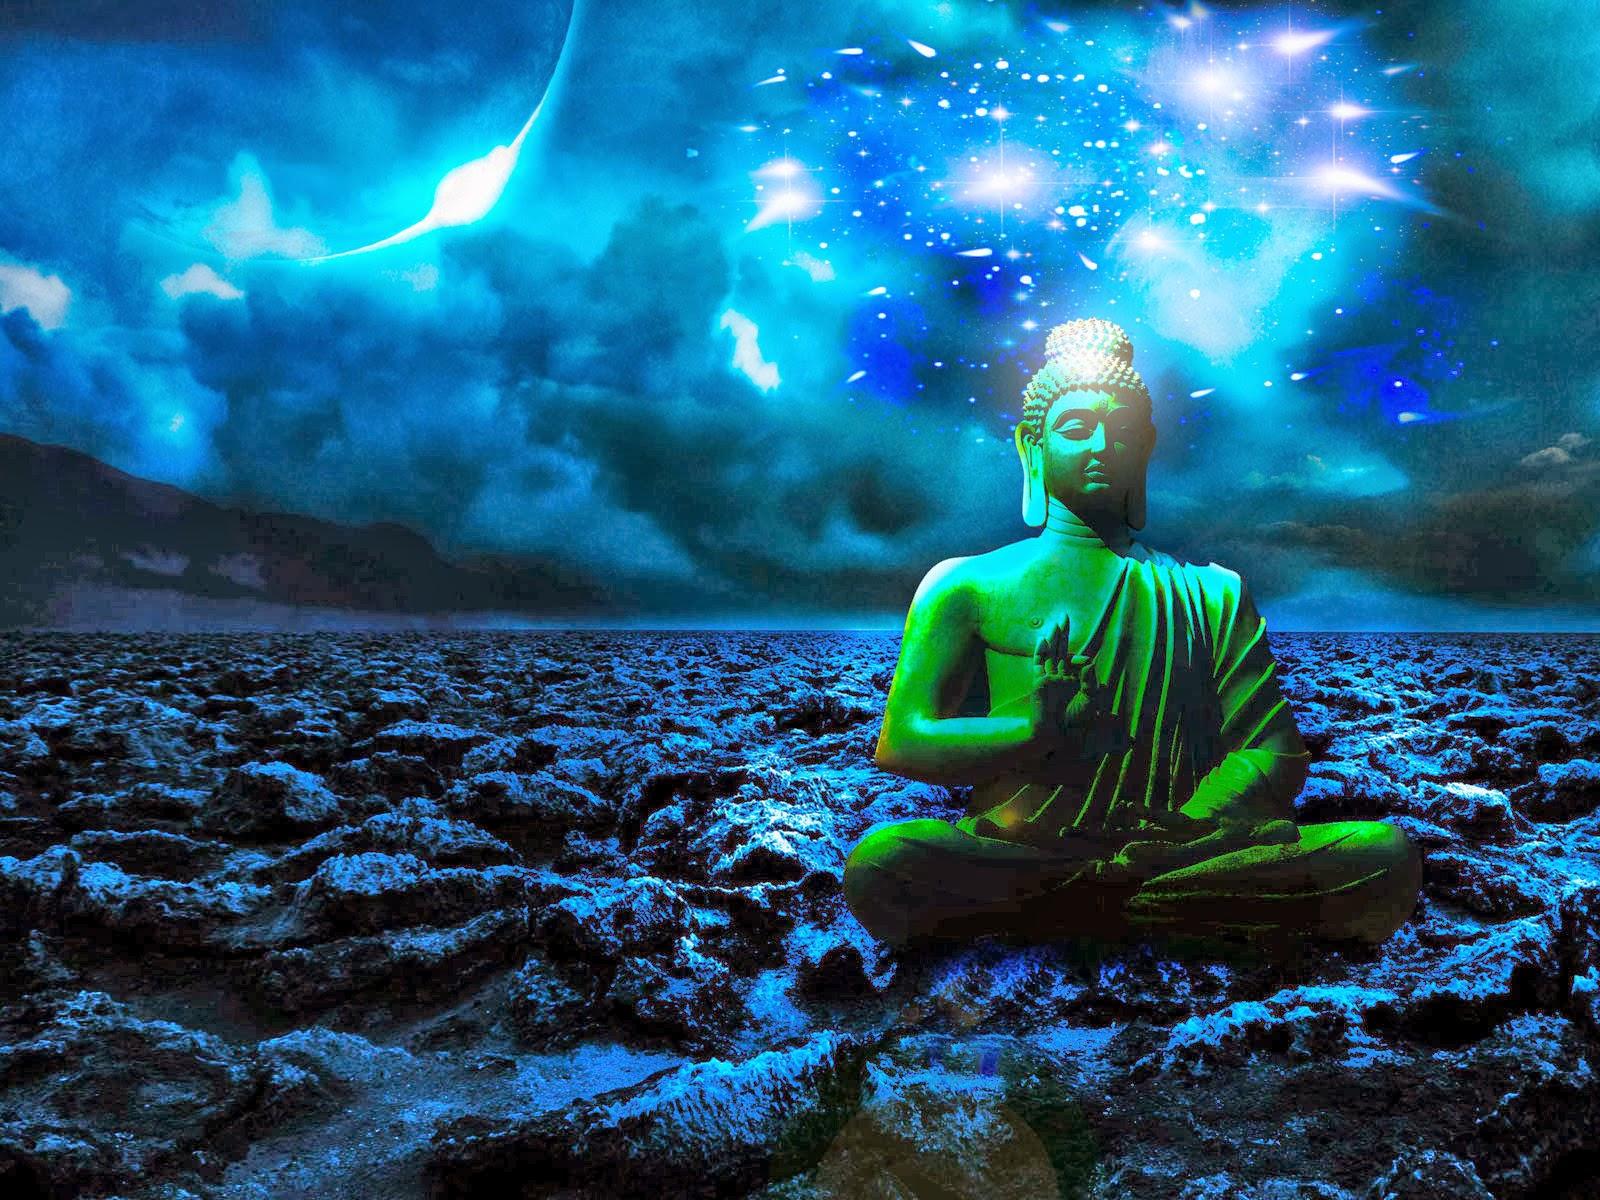 Lord Shiva Animated Wallpapers For Mobile Buddha Wallpapers Hindu God Wallpaper